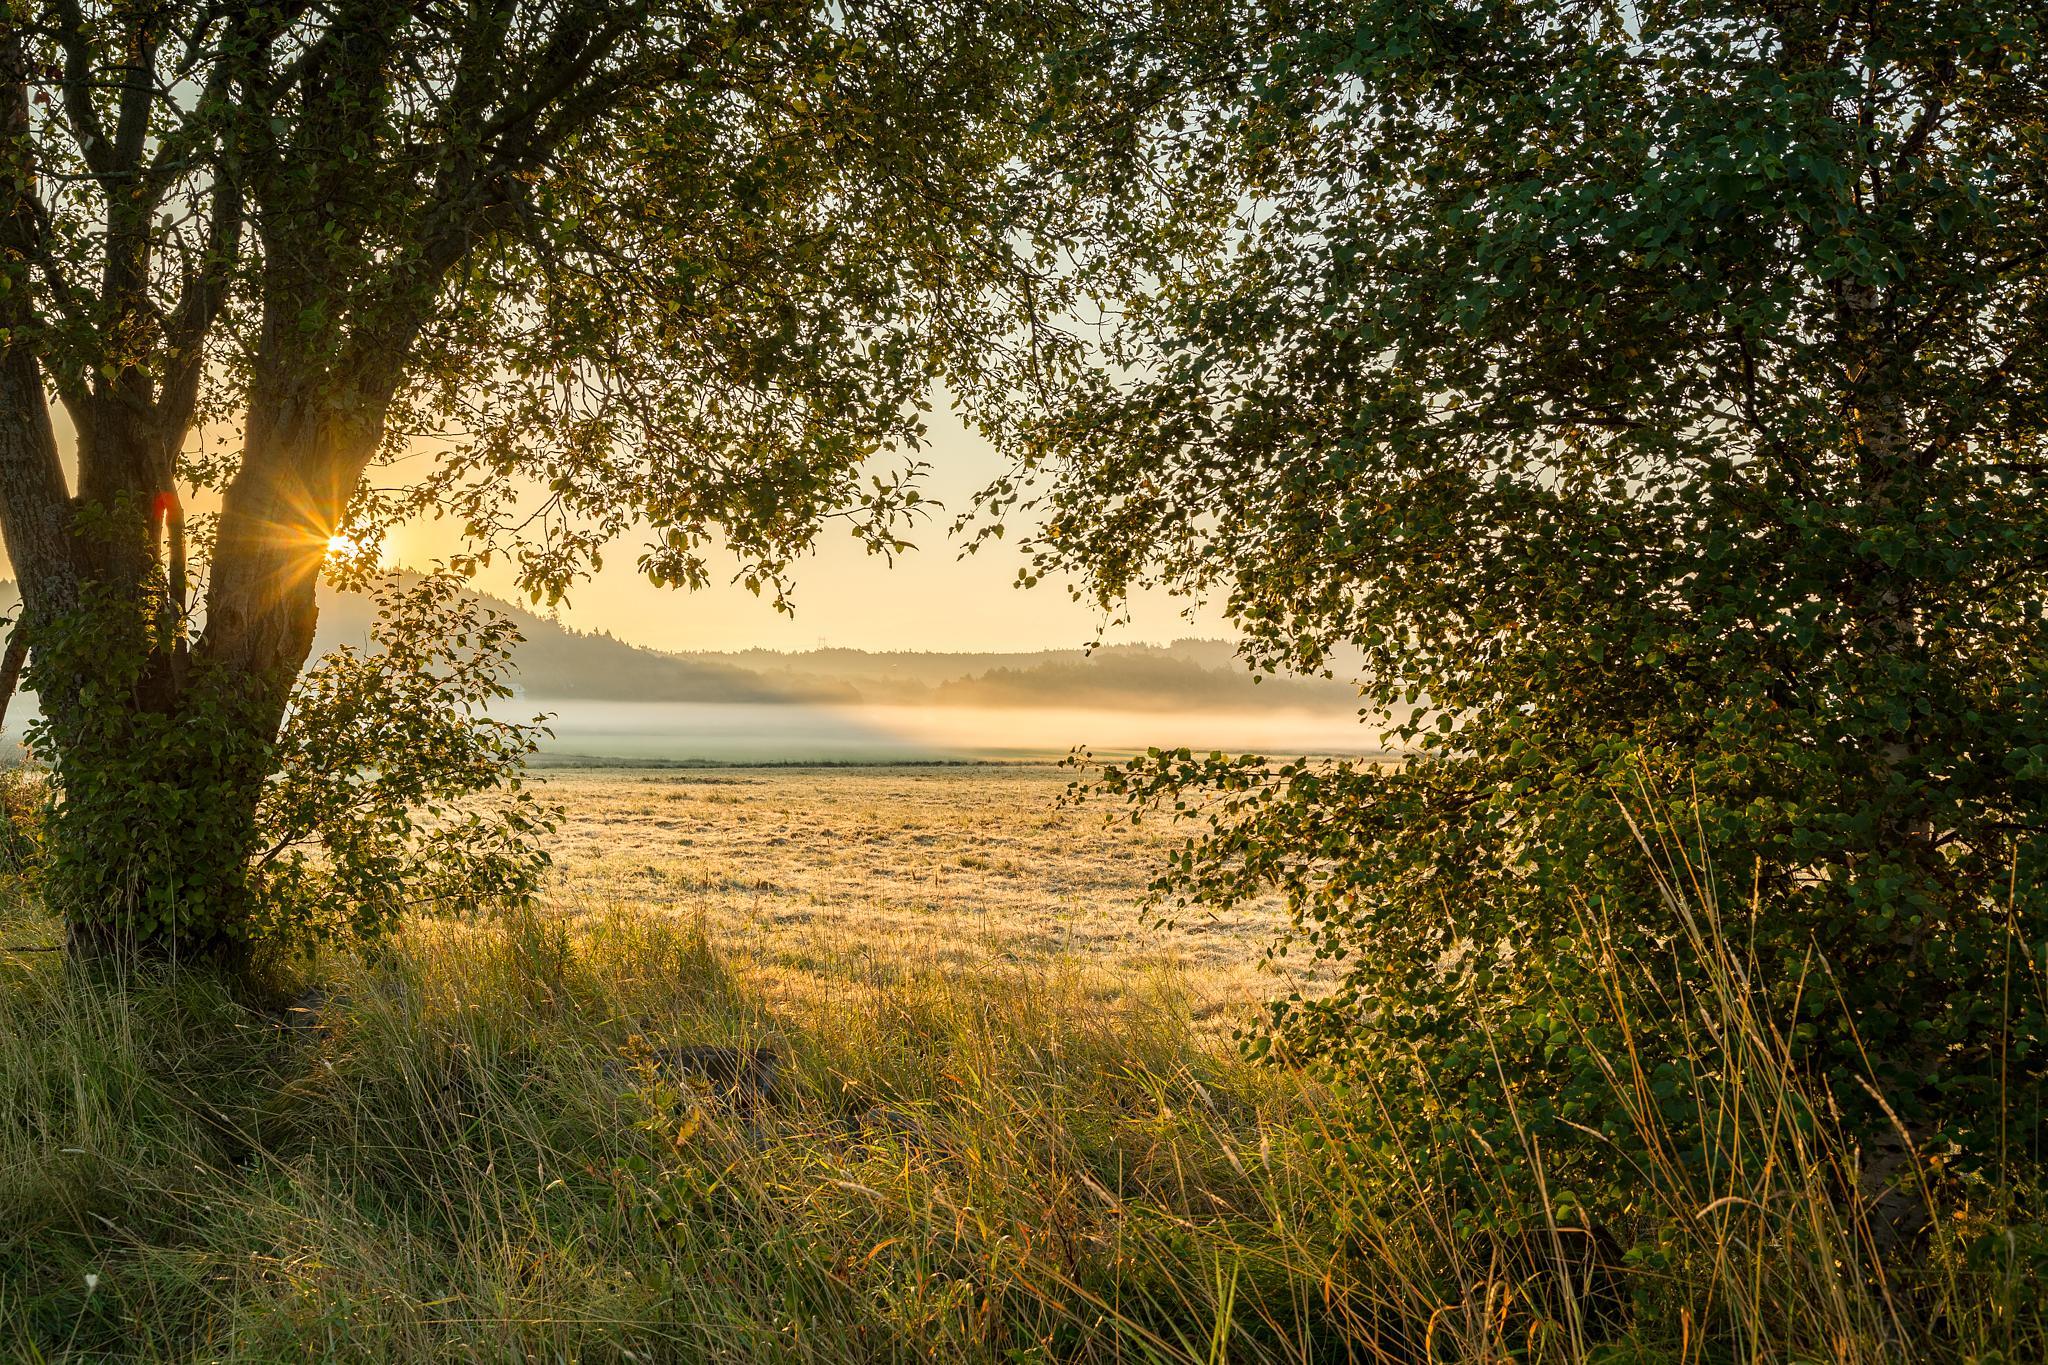 Sunrise #3 by JRoest